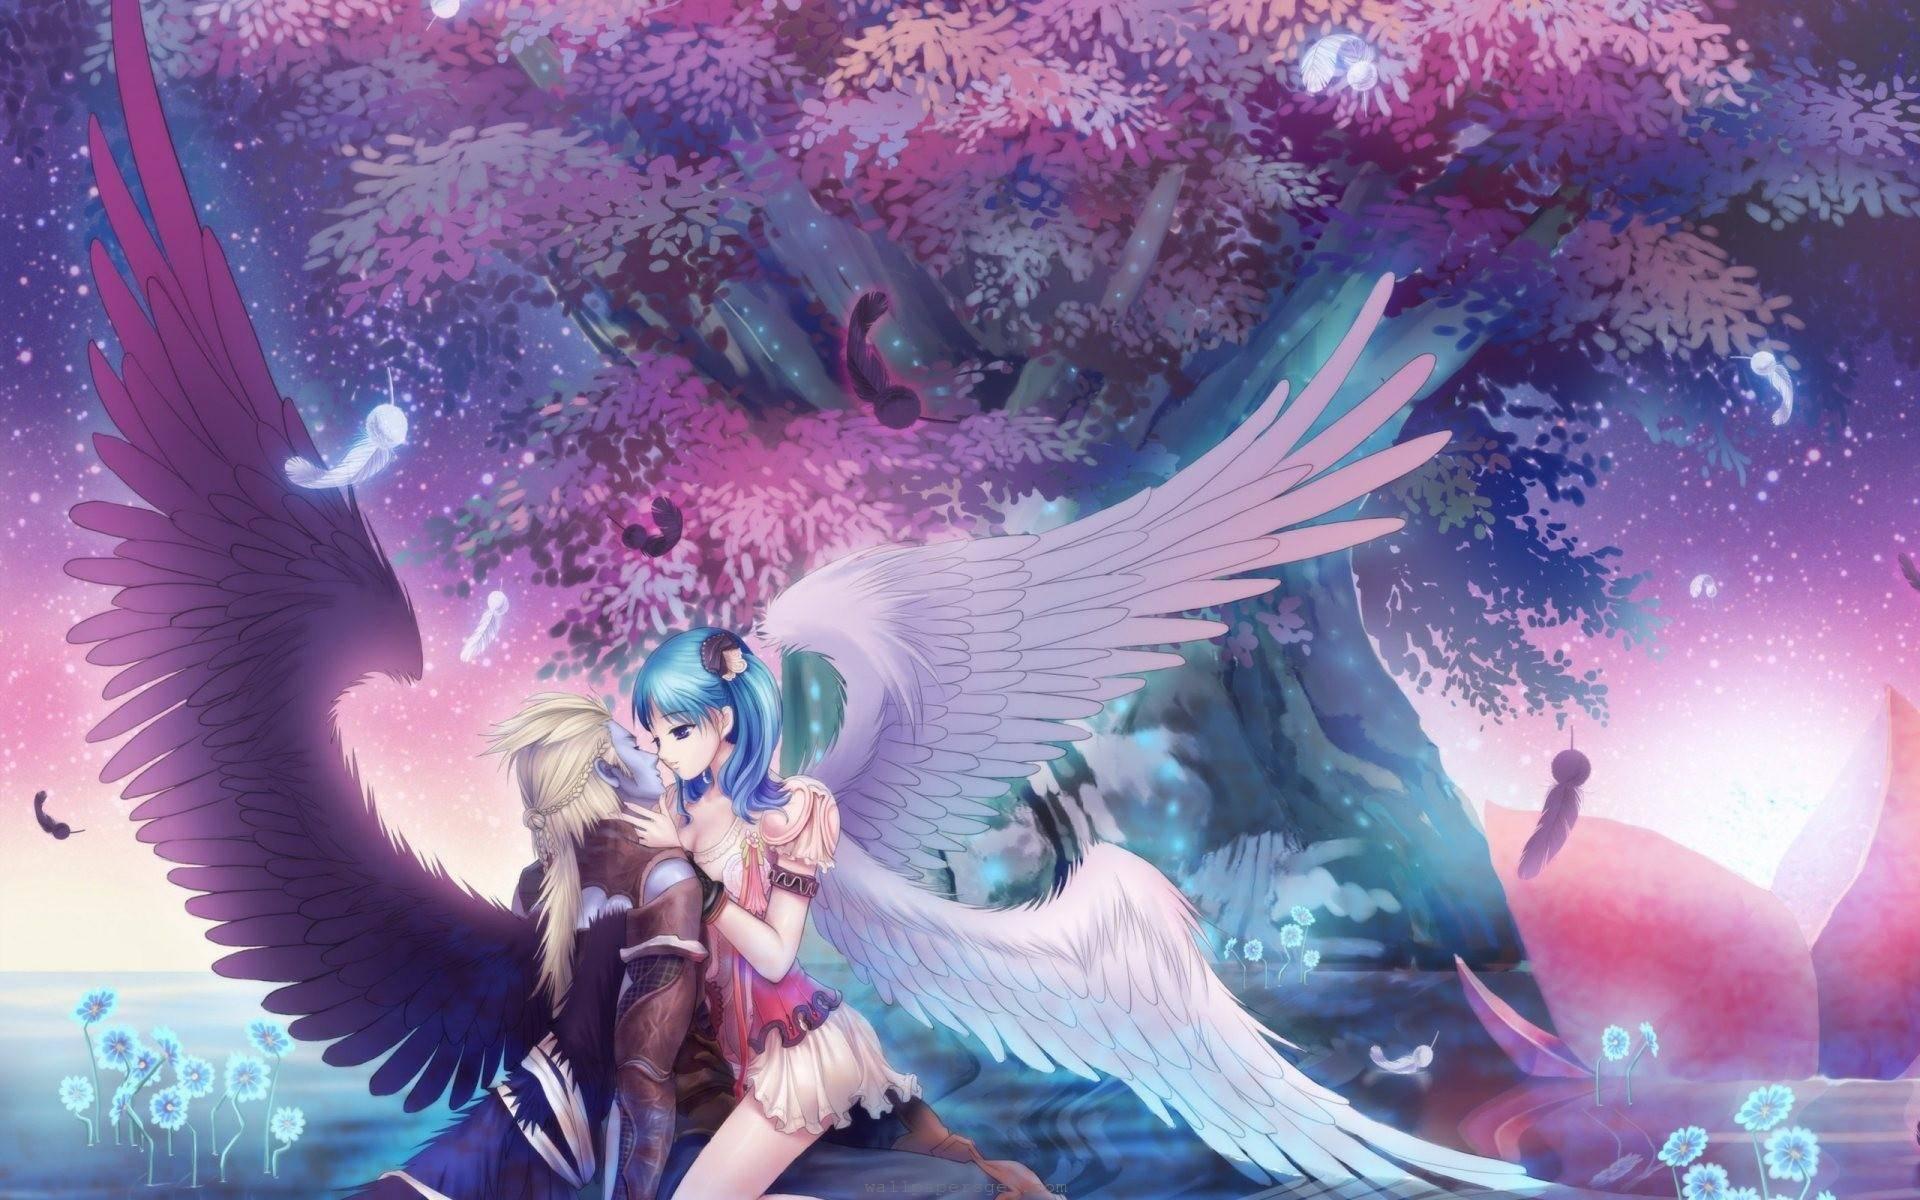 Wallpaper anime love wallpapersafari - Anime backgrounds com ...